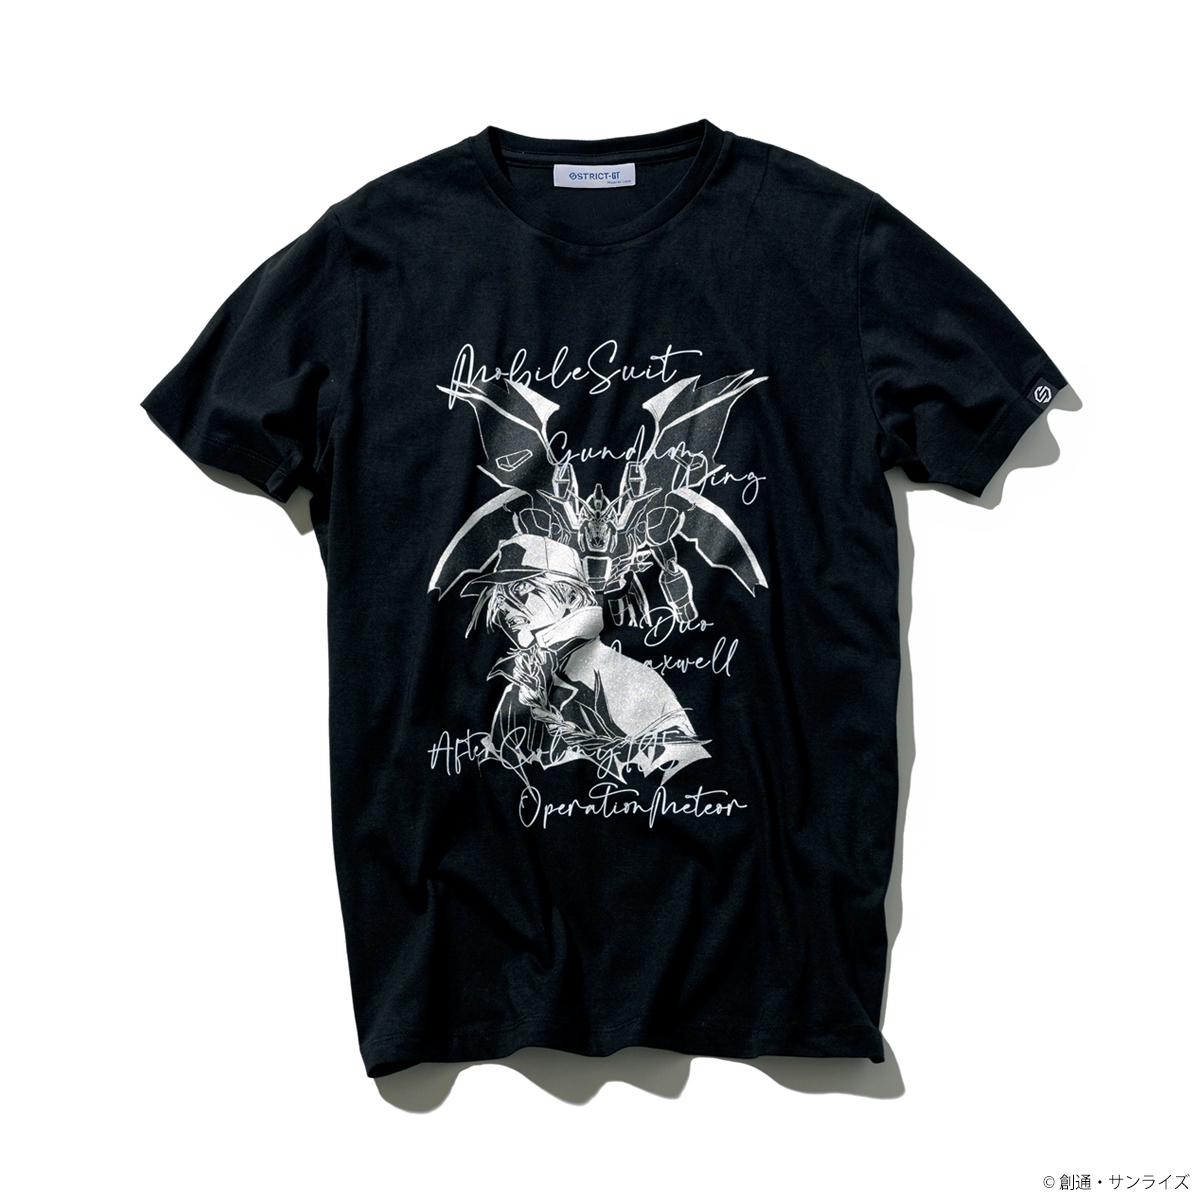 STRICT-G 『新機動戦記ガンダムW』 Tシャツ デュオ・マックスウェル